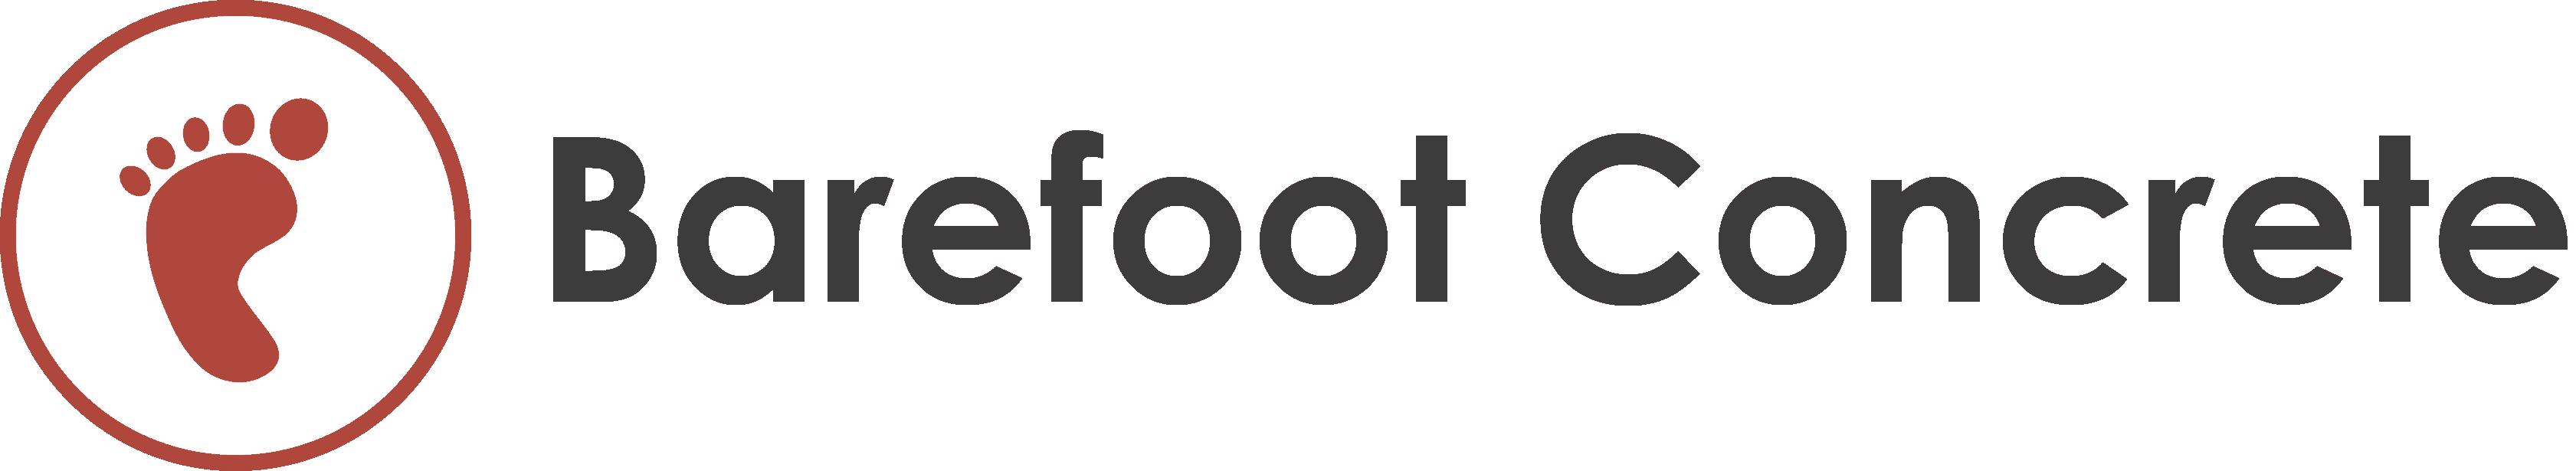 Barefoot Concrete